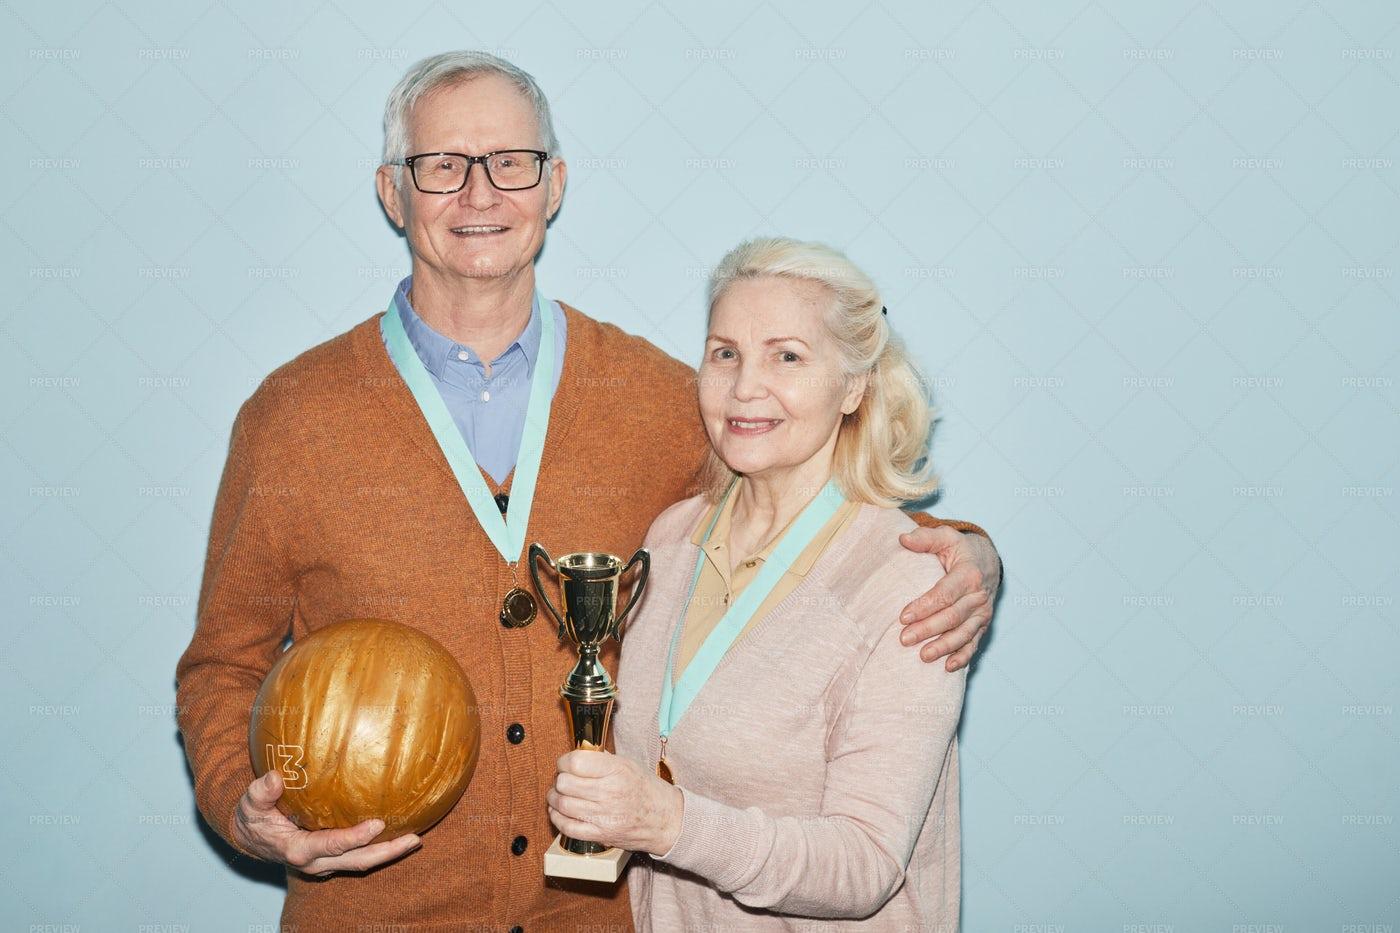 Couple Of Senior Bowling Players: Stock Photos